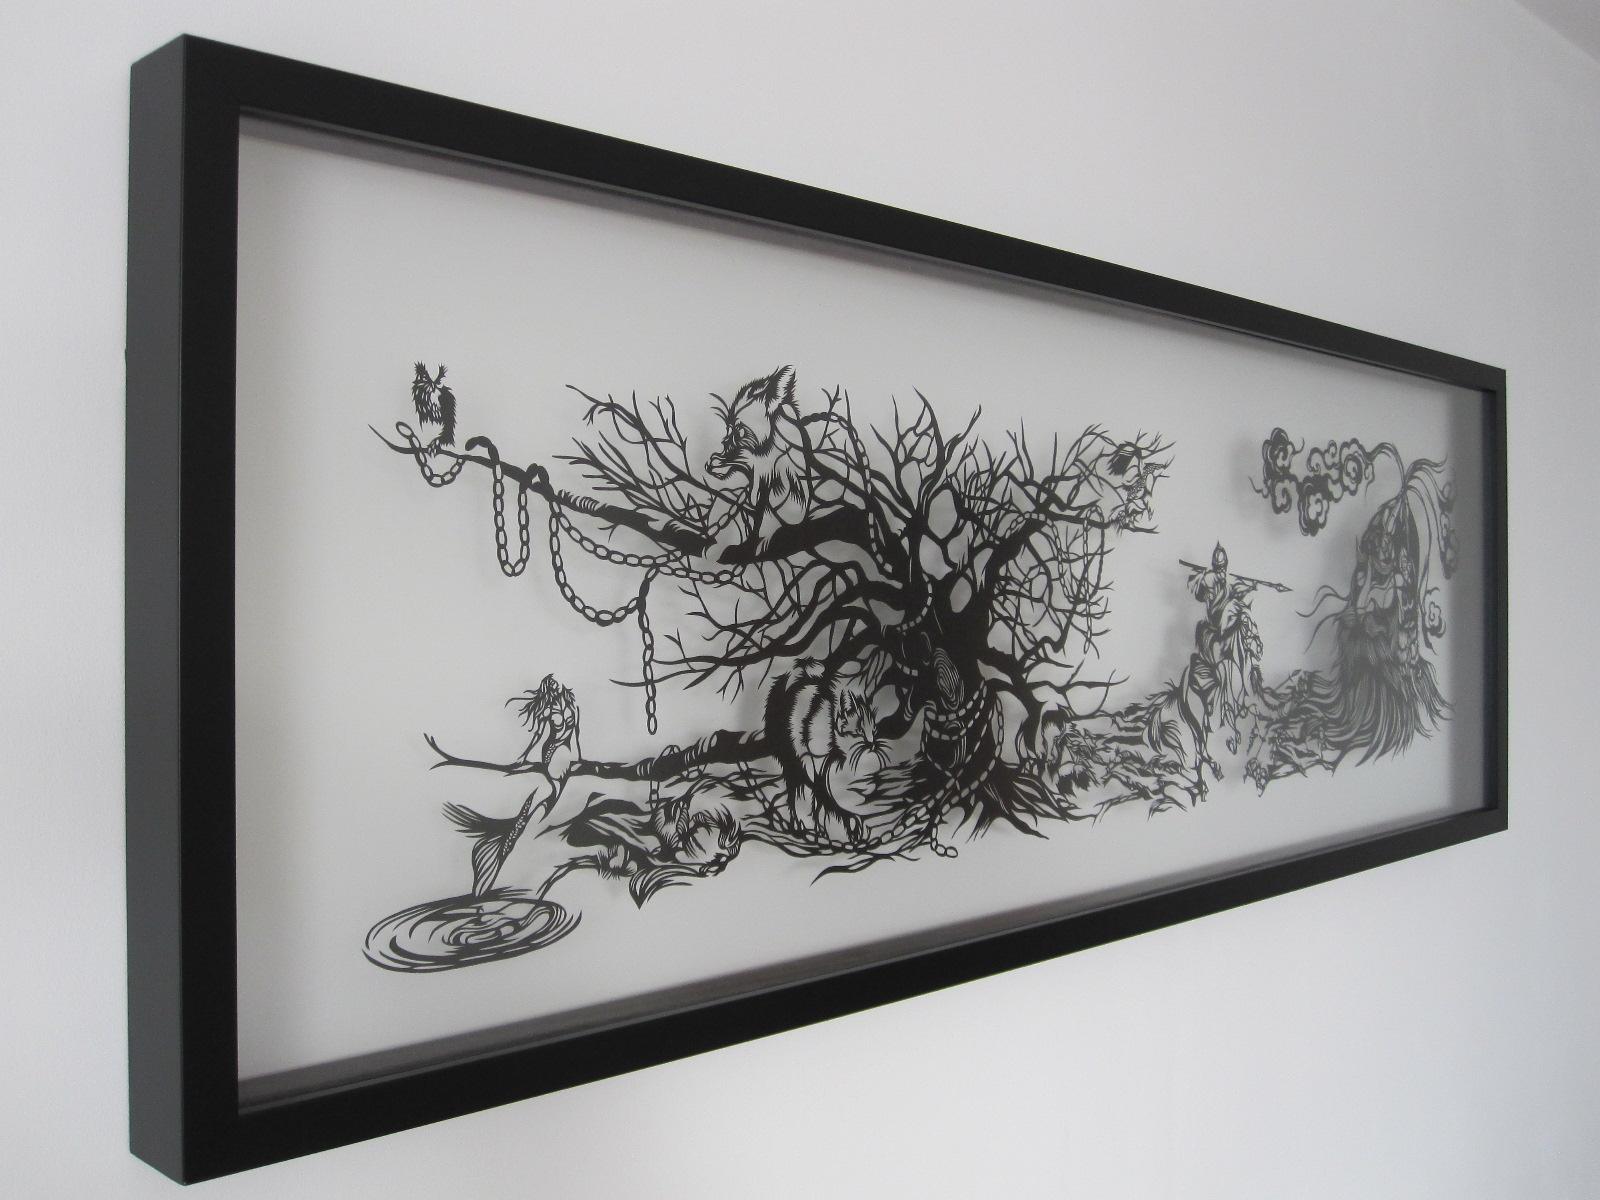 Paper Cut Art - Russian Folktale - Ruslan i Lyudmila - Nahoko Kojima